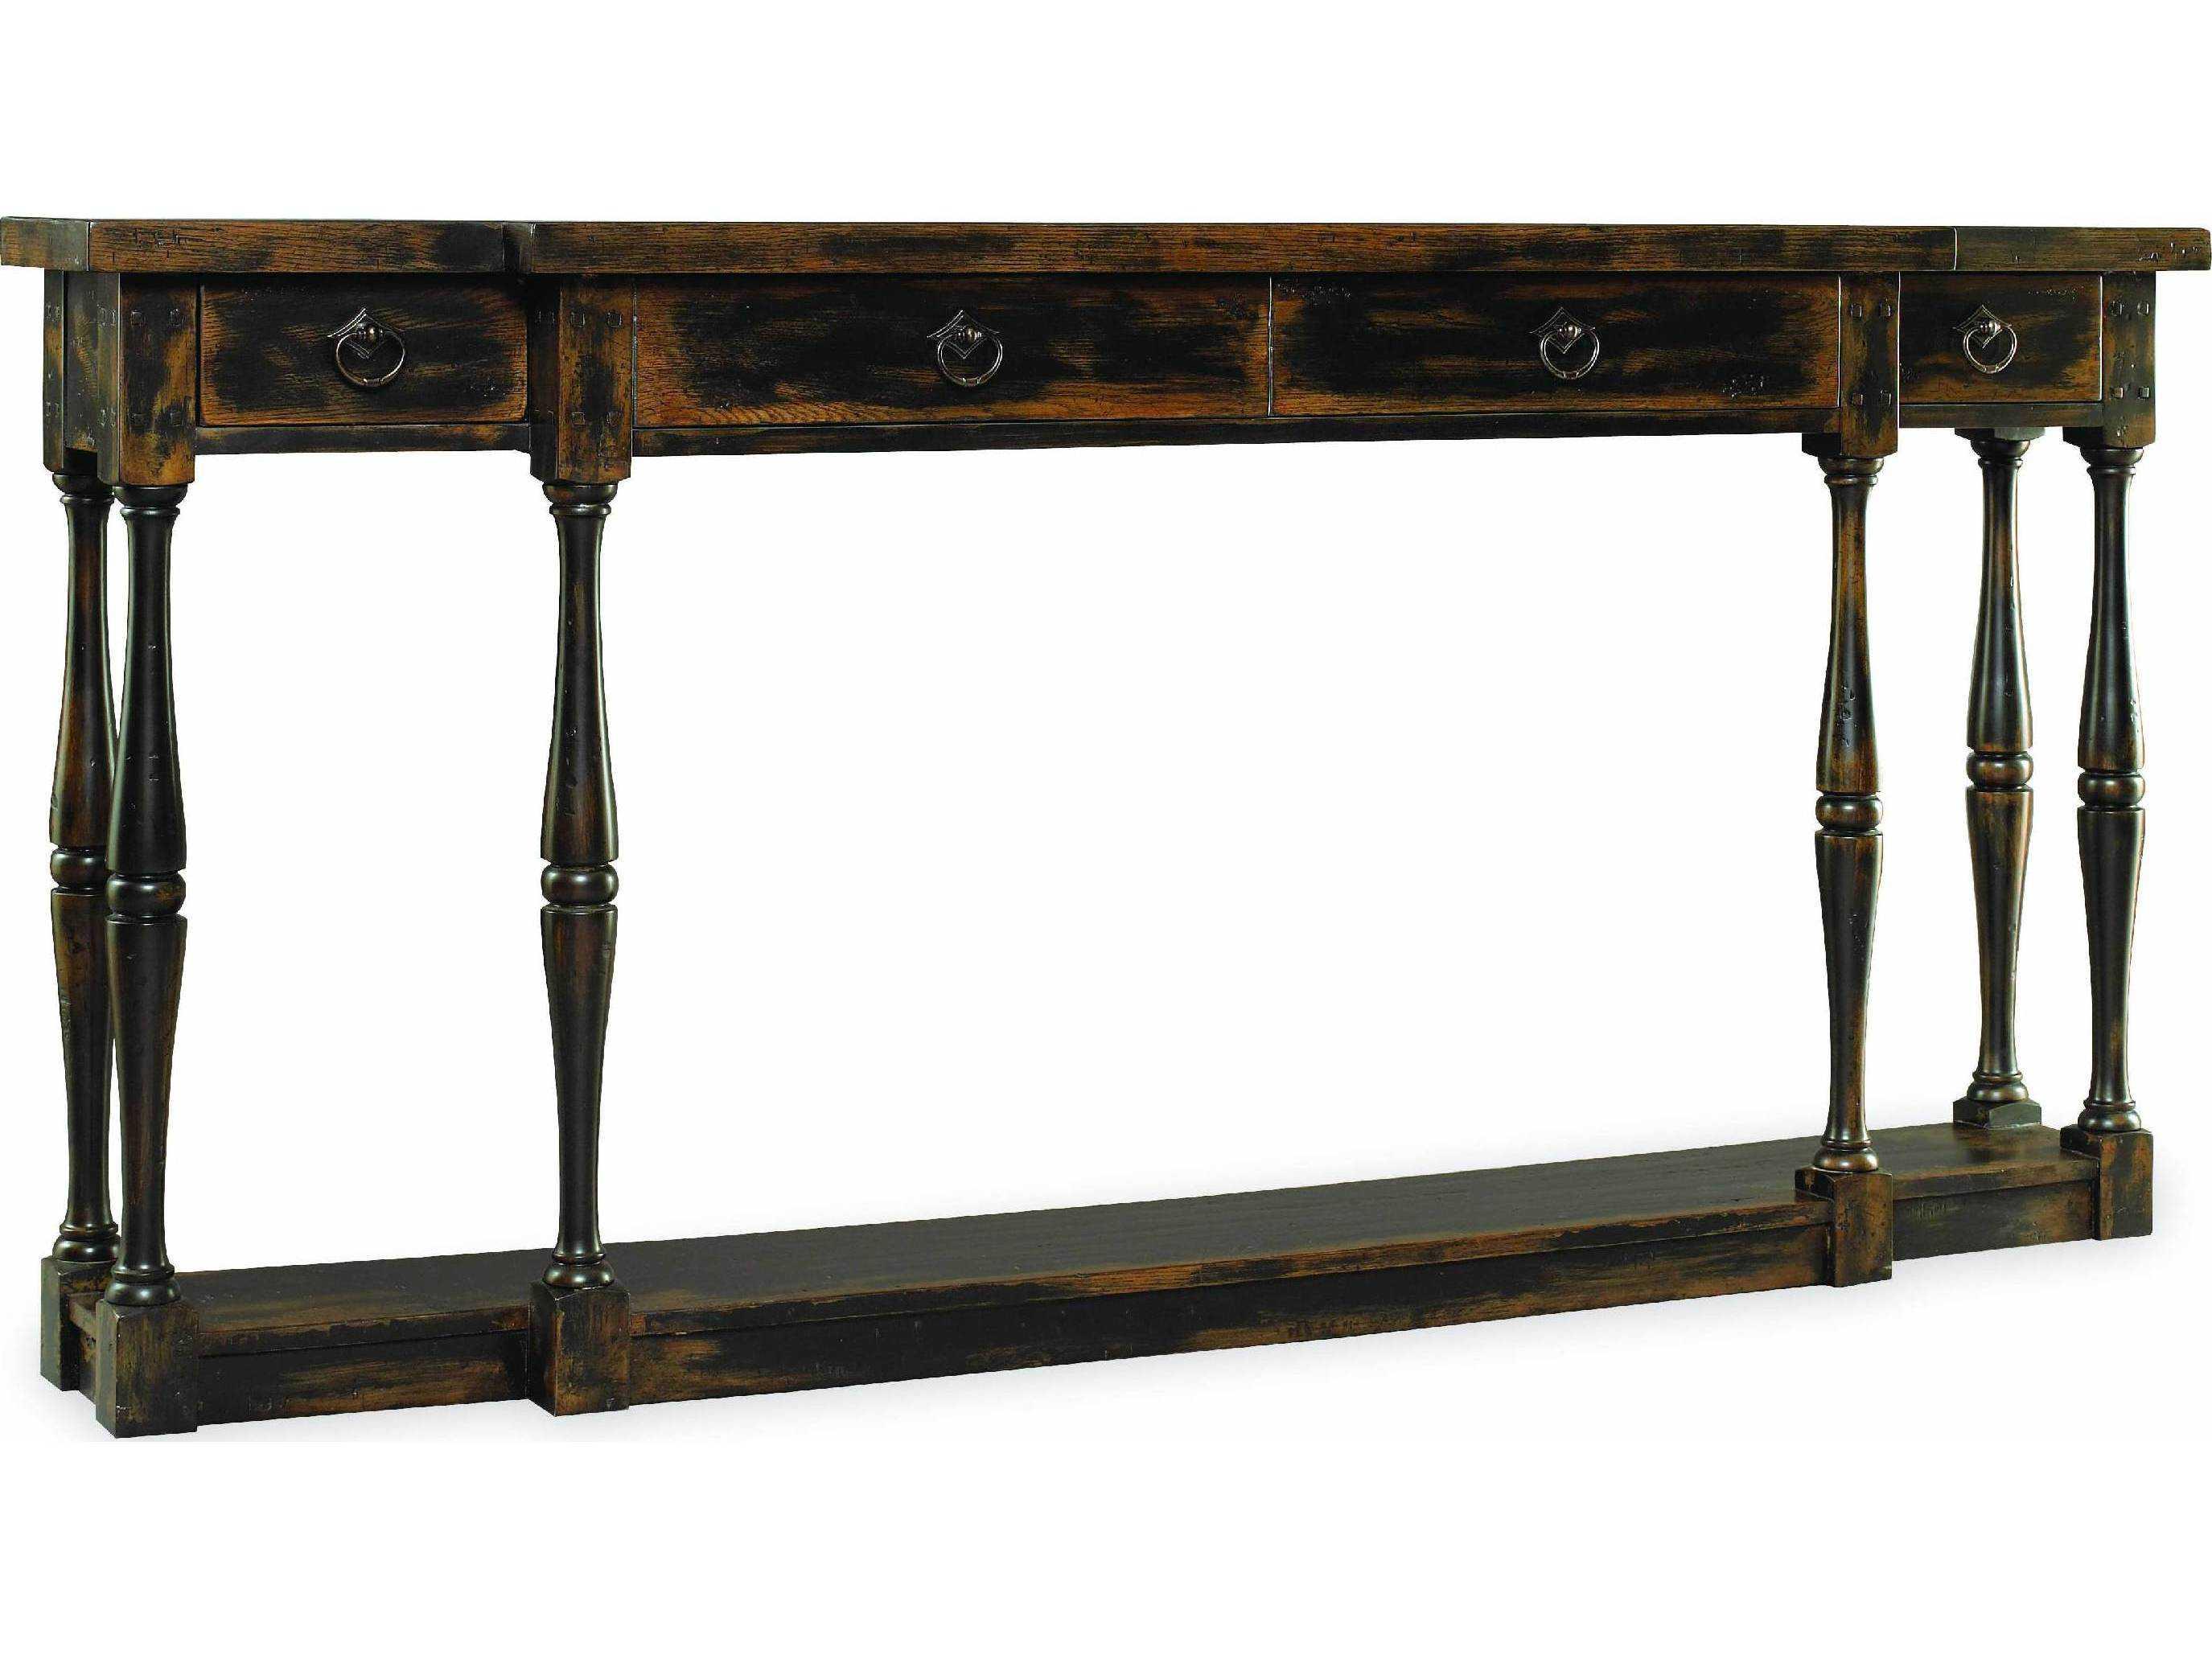 Hooker furniture sanctuary ebony 72 39 39 l x 12 39 39 w rectangular for Sofa table 72